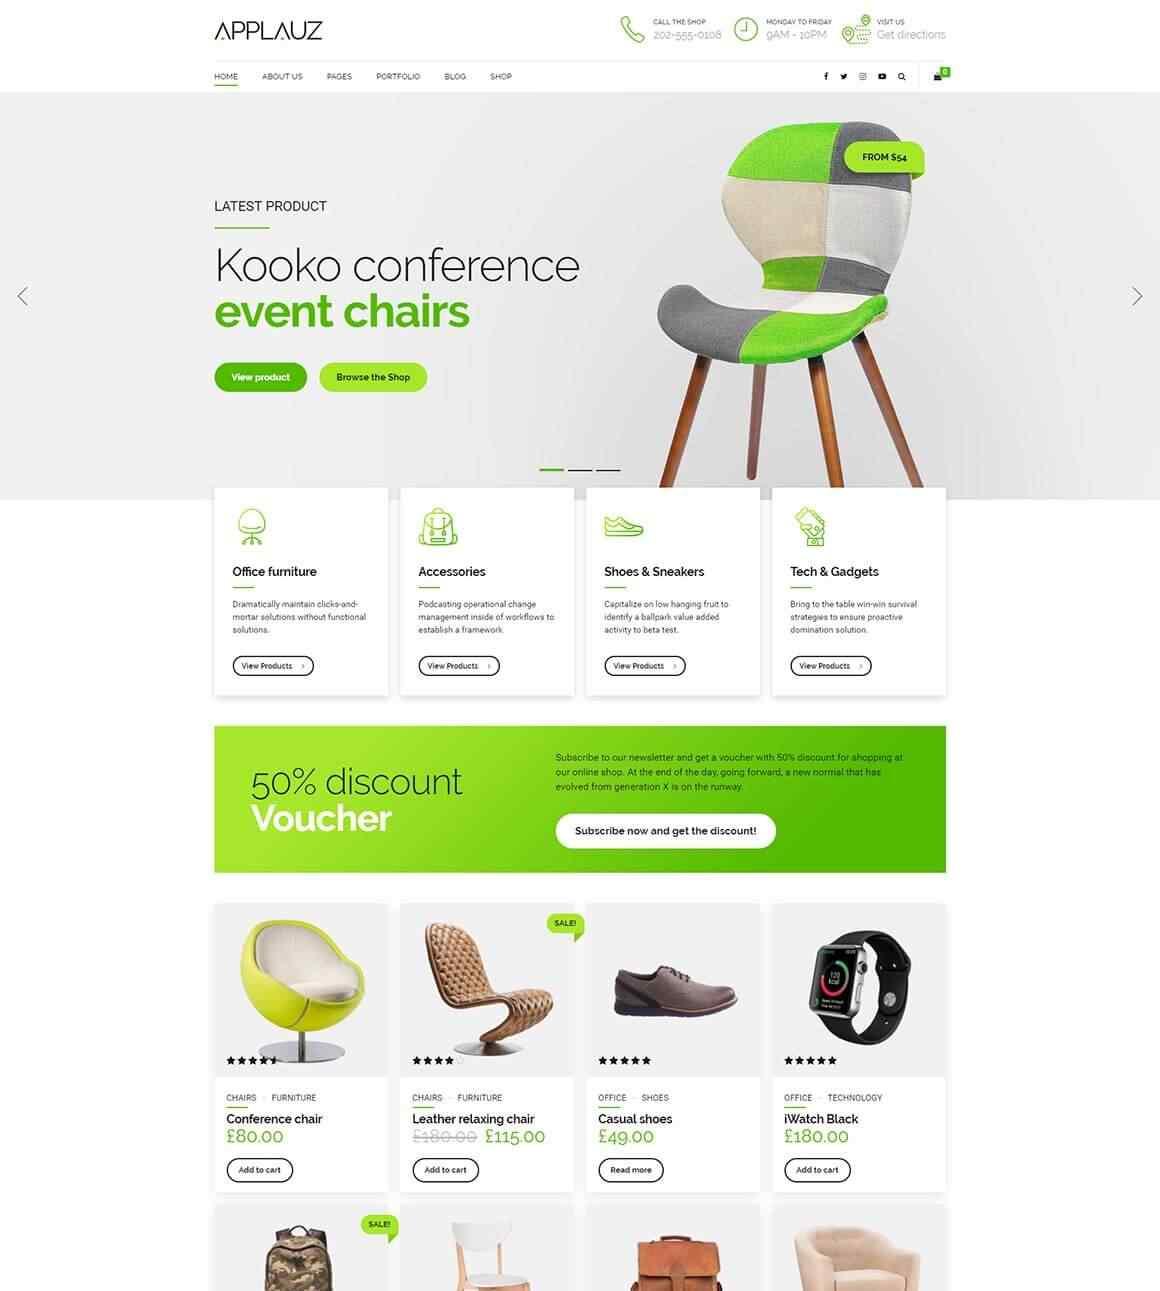 https://www.mediaircare.de/wp-content/uploads/2017/11/Screenshot-Shop.jpg